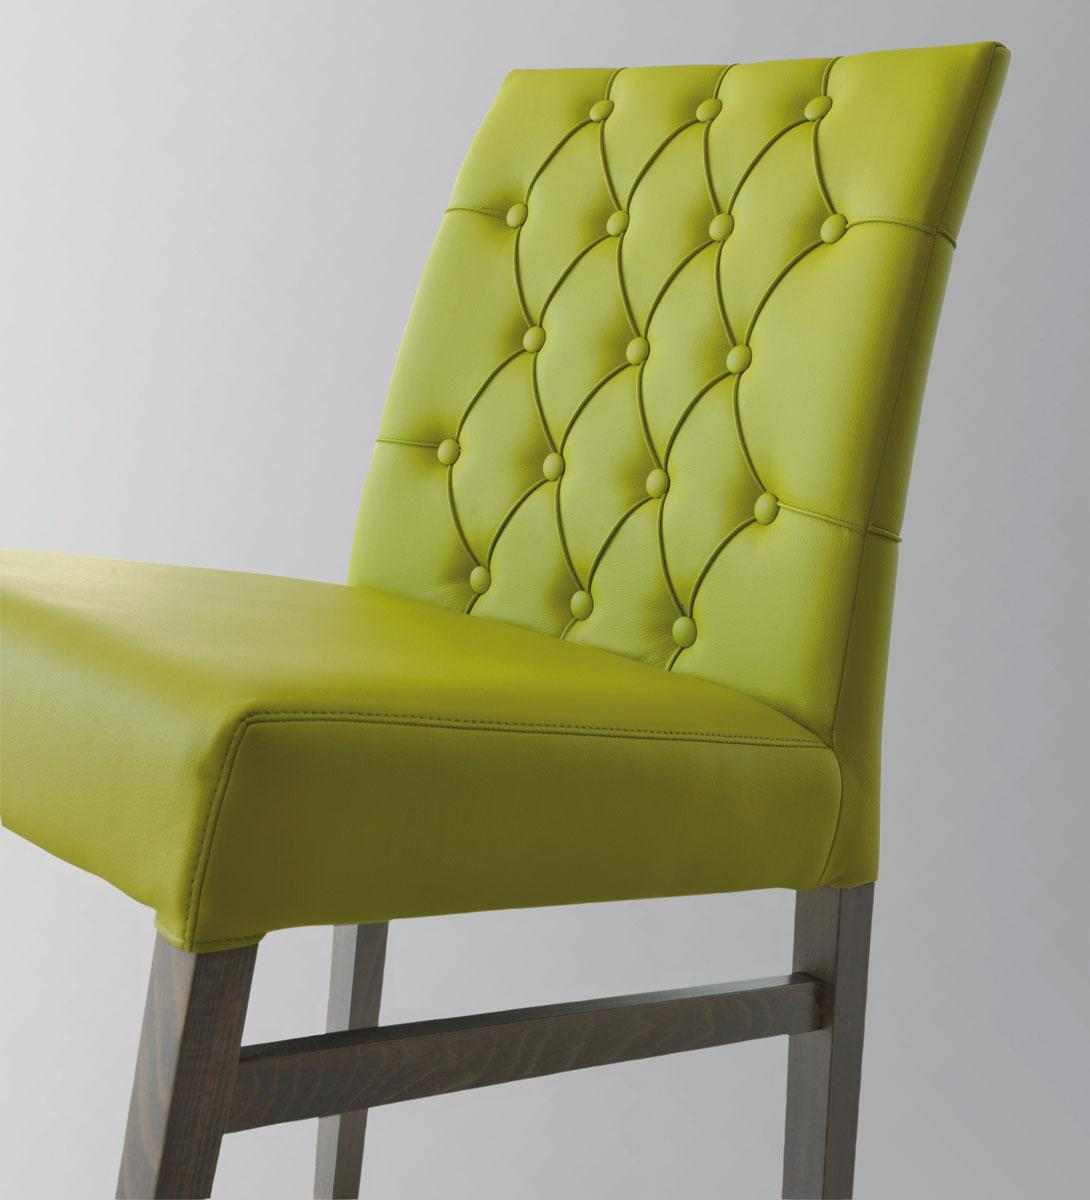 bloom chaise capitonn e idd. Black Bedroom Furniture Sets. Home Design Ideas